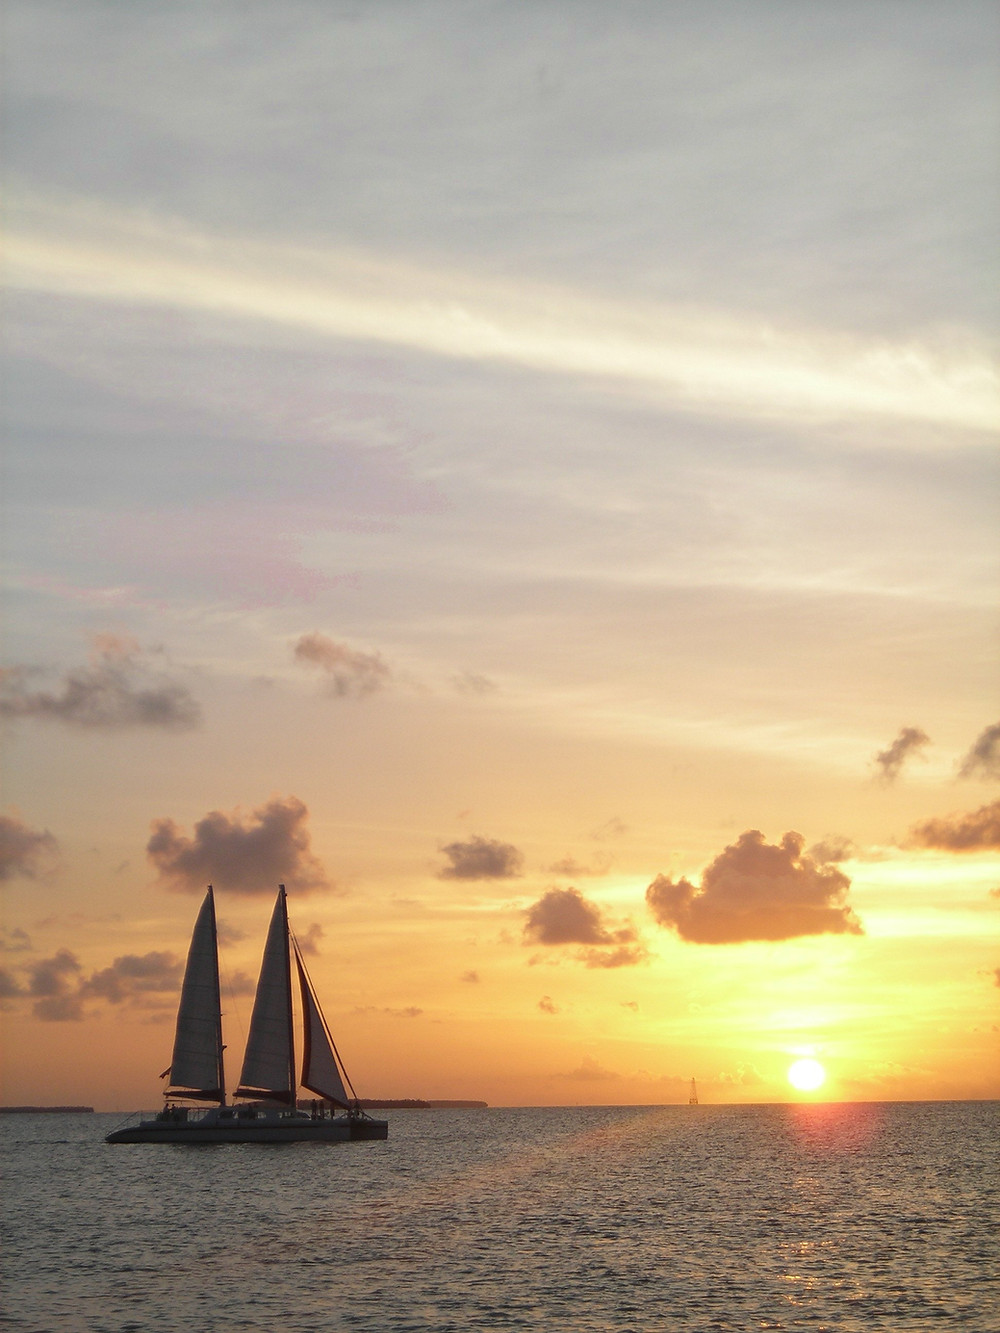 Sailboat at Sunset Mallory Square, Key West travel